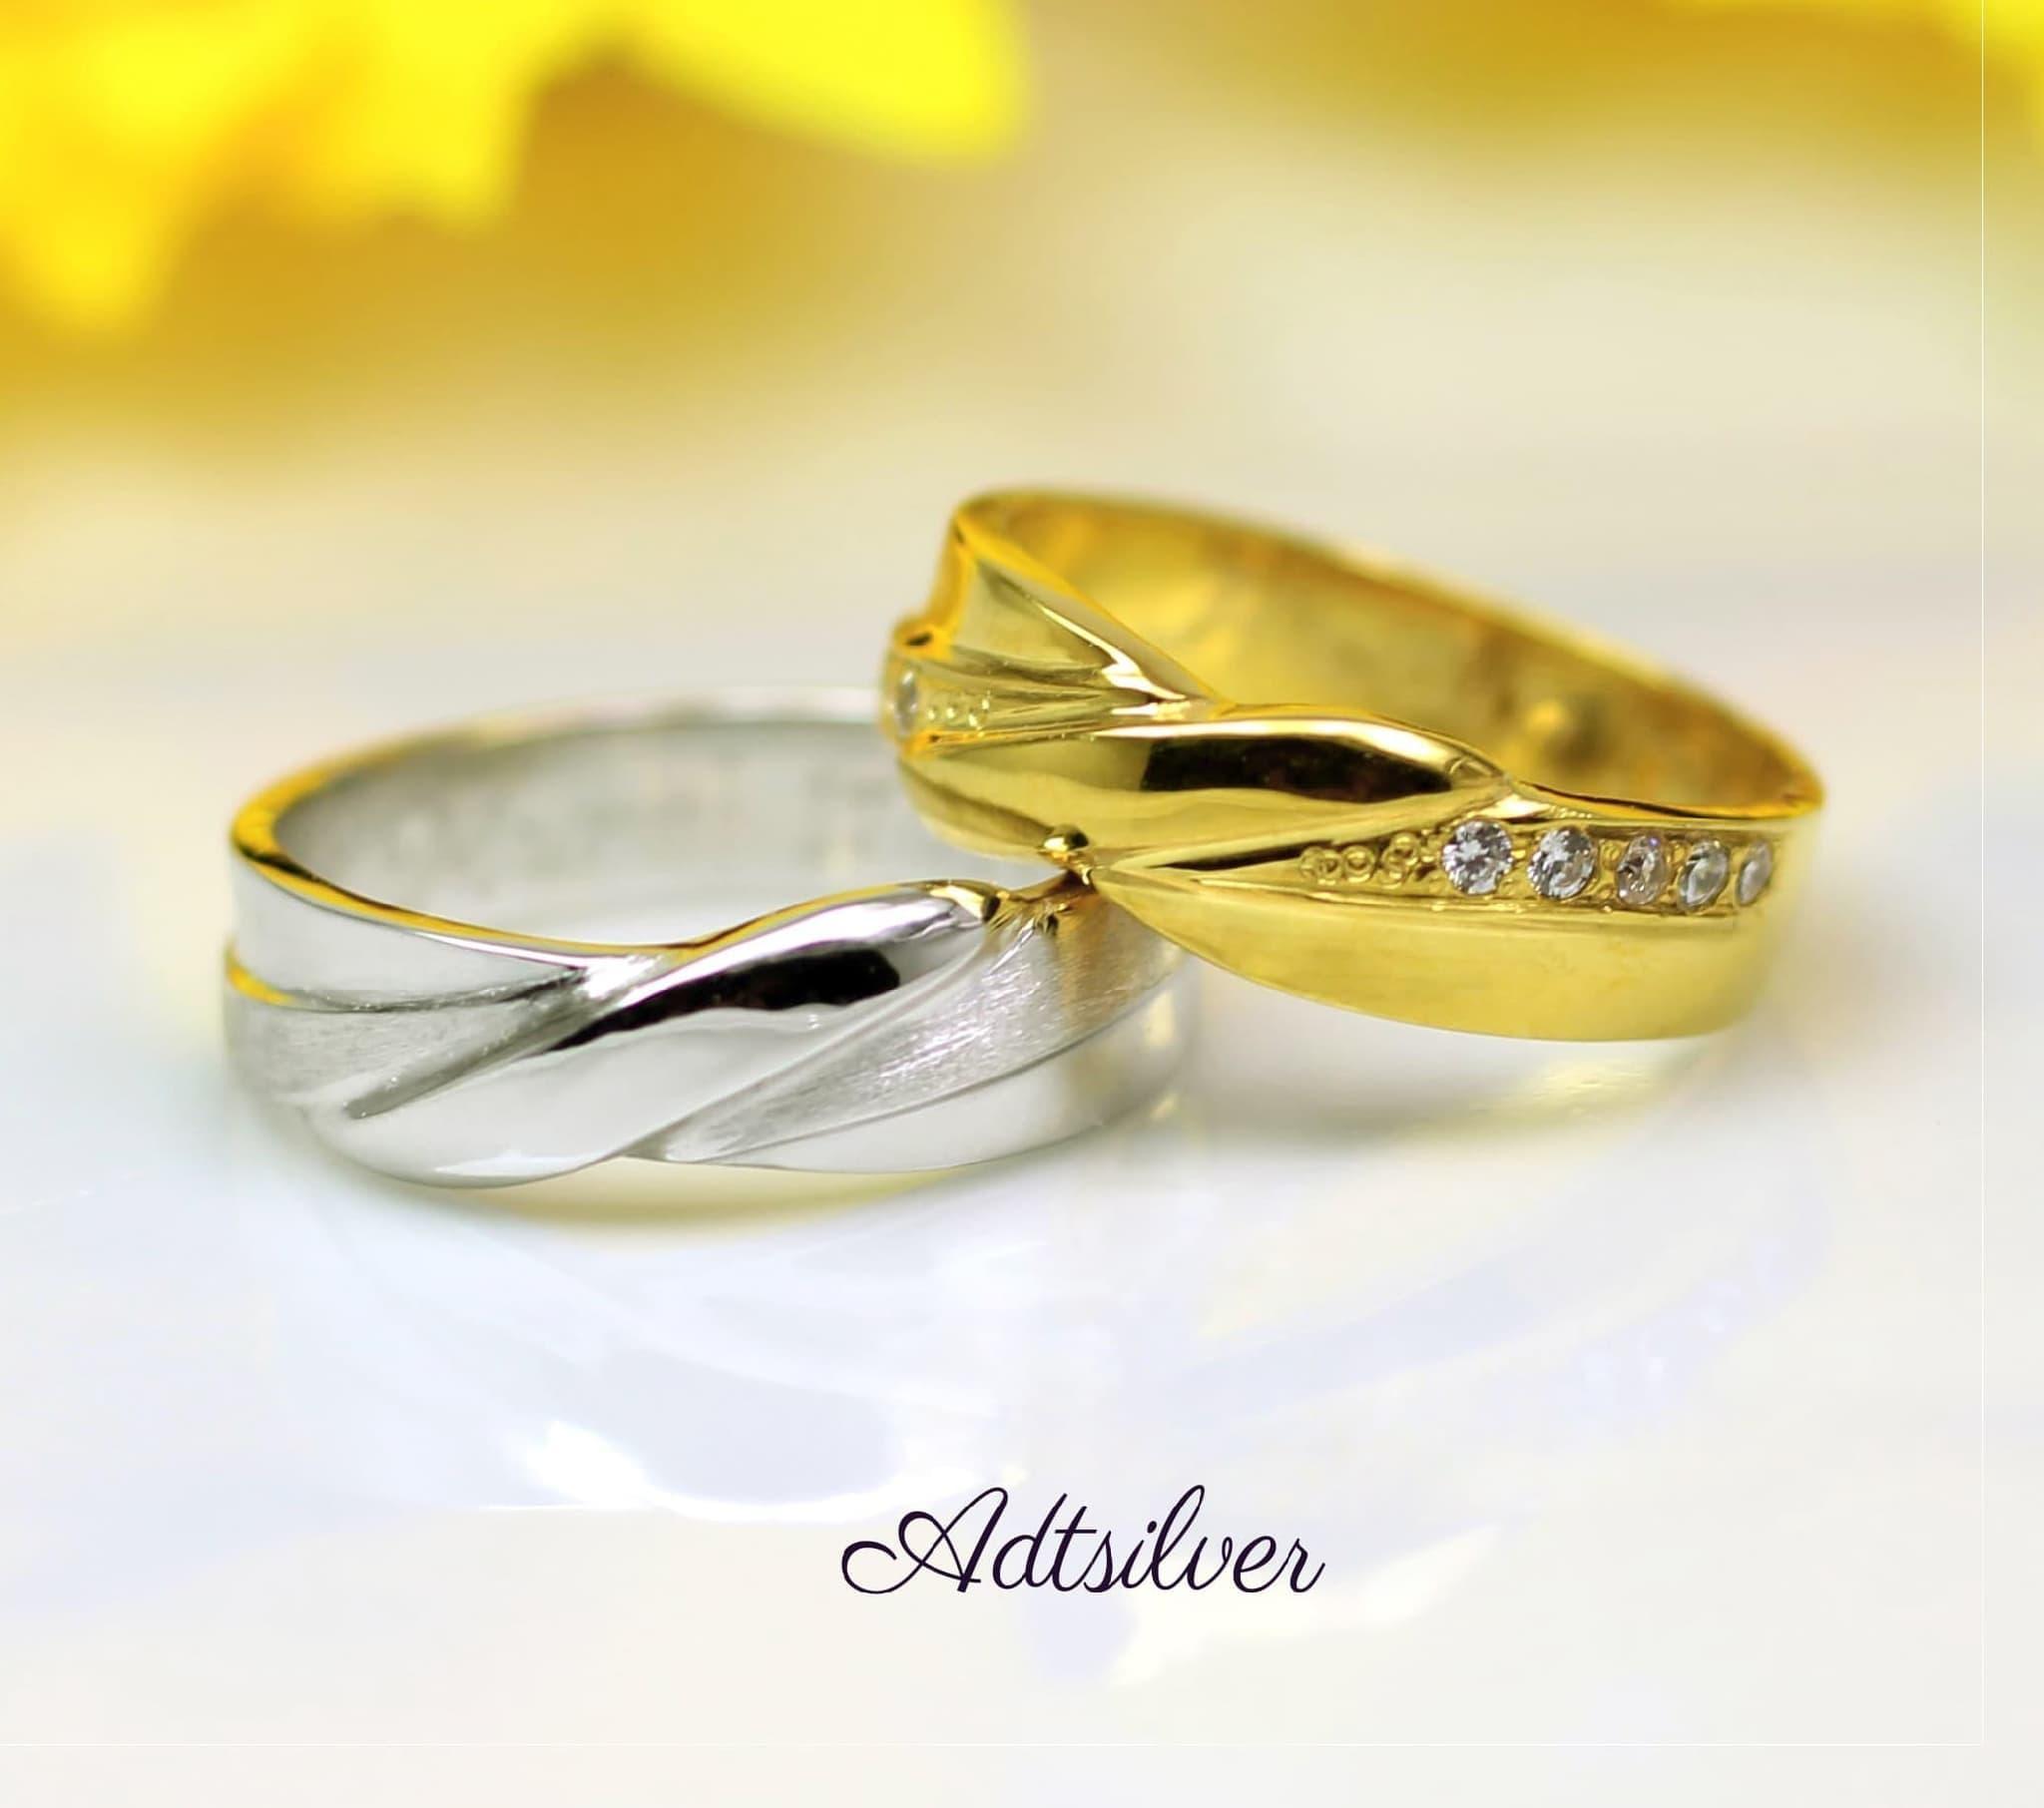 Jual Cincin Kawin Emas Dan Palladium Tunangan Nikah Couple 23 Pernikahan 023 Damitri Tokopedia